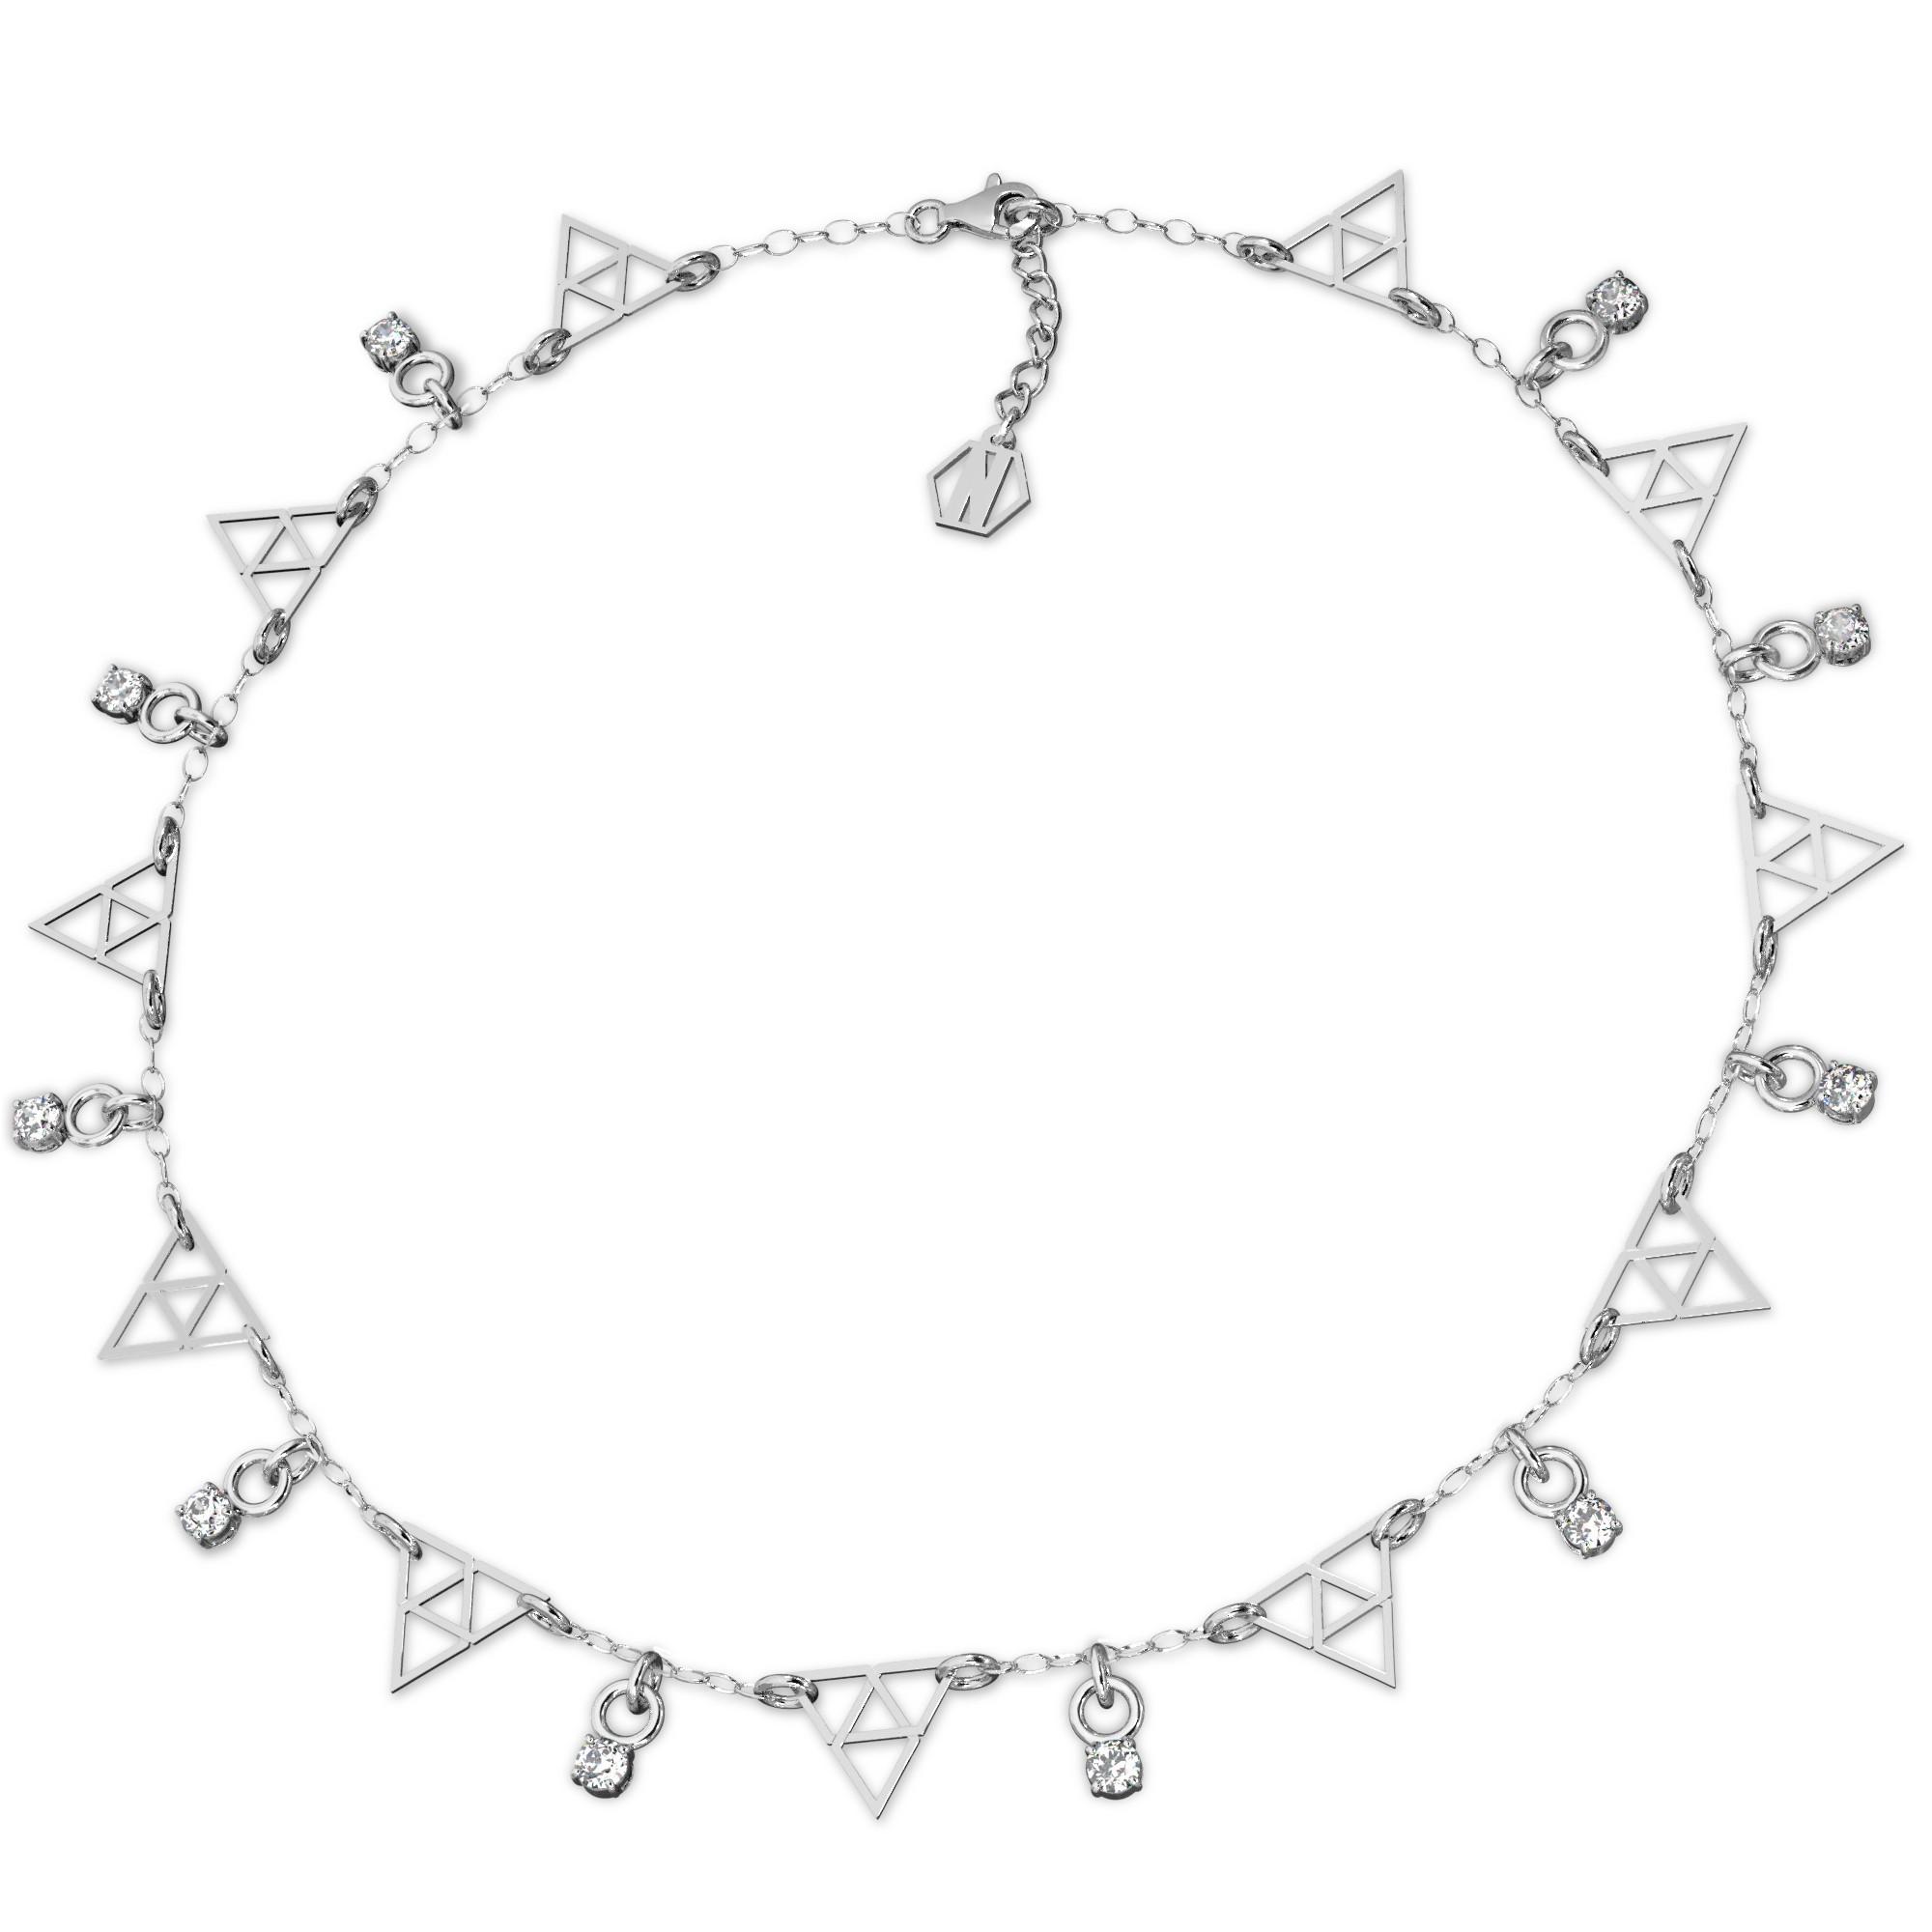 Srebrny choker trójkąty z cyrkoniami srebro 925, Nikki Lund